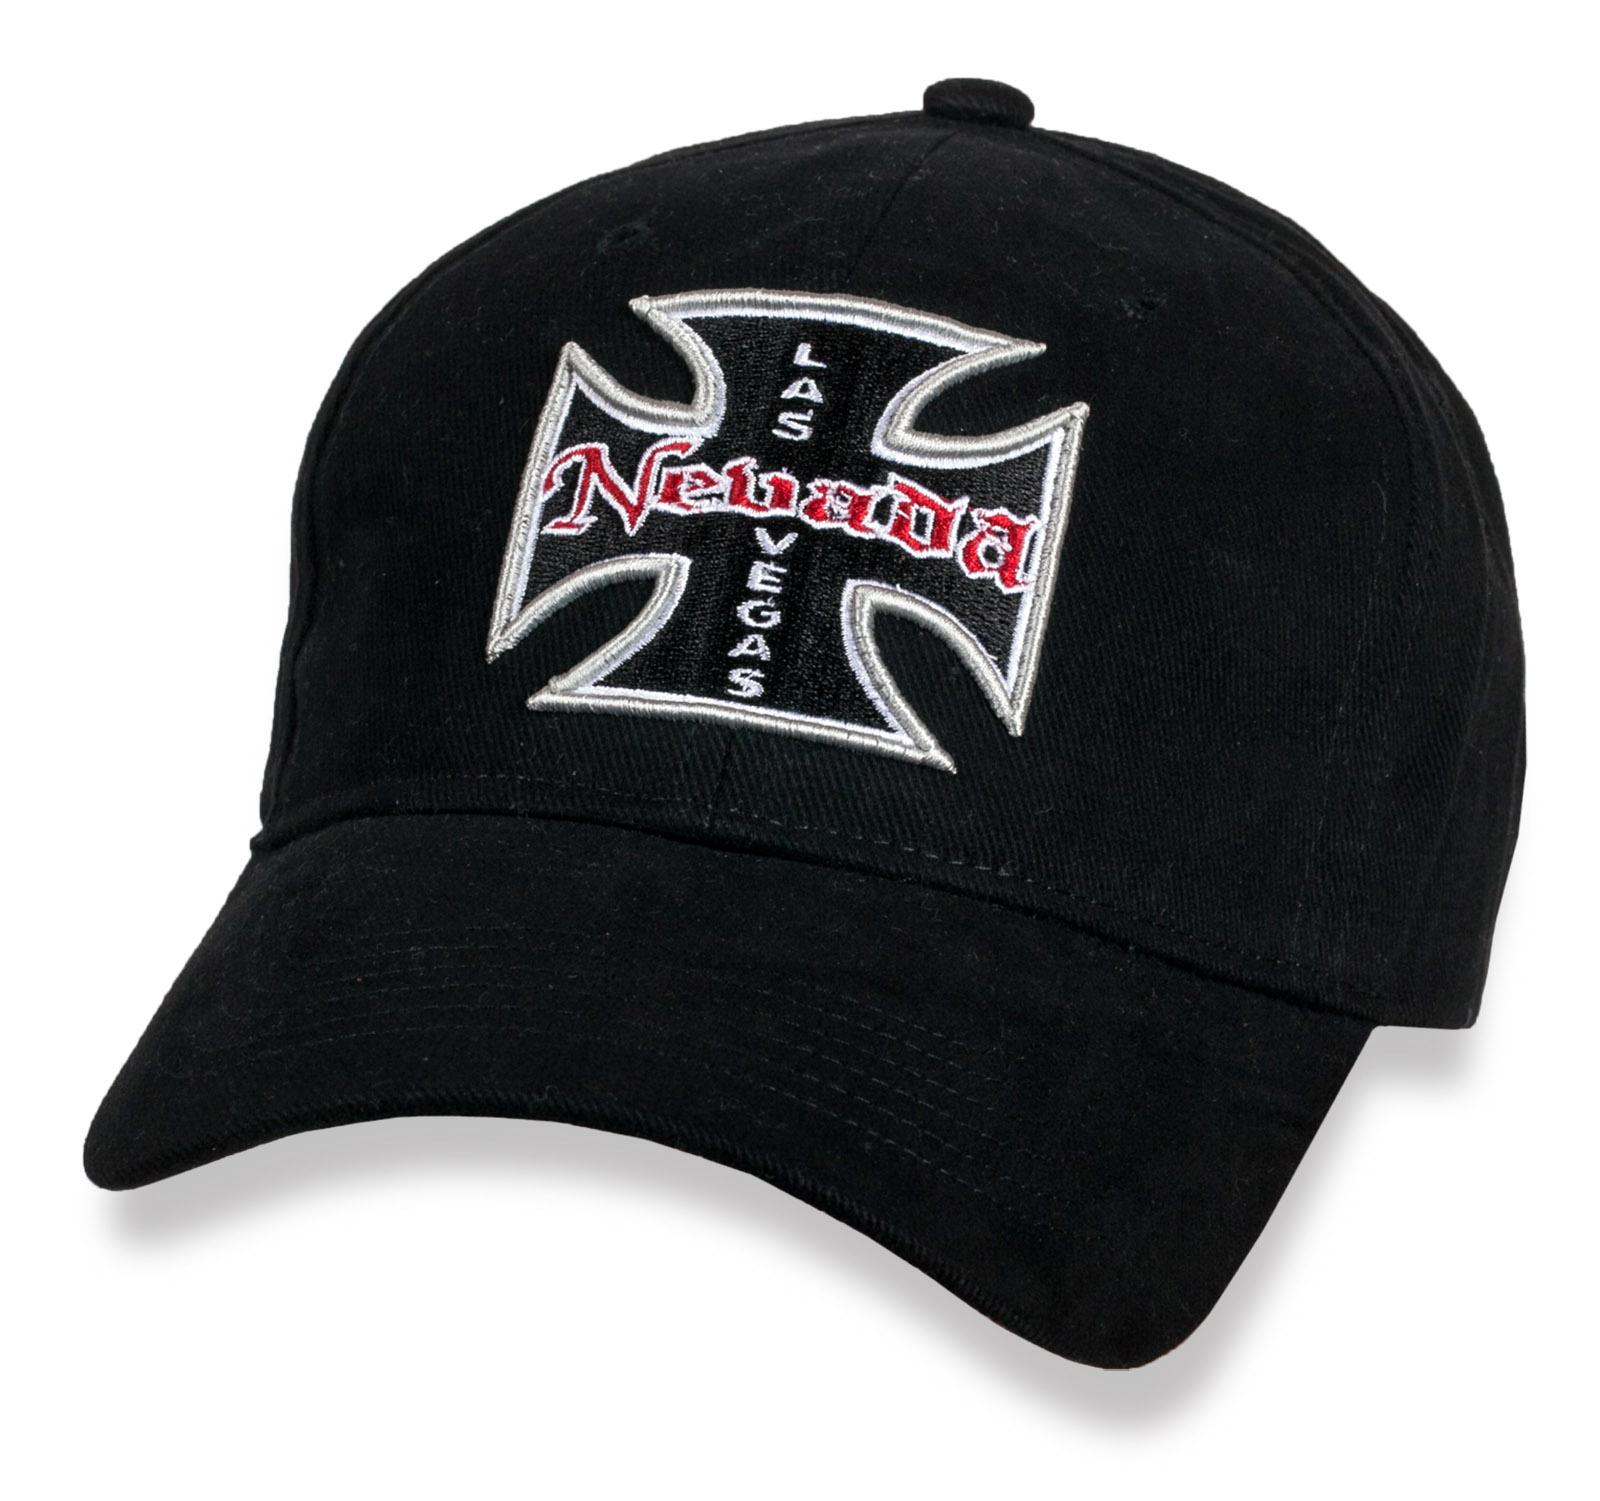 Фирменная бейсболка Nevada.